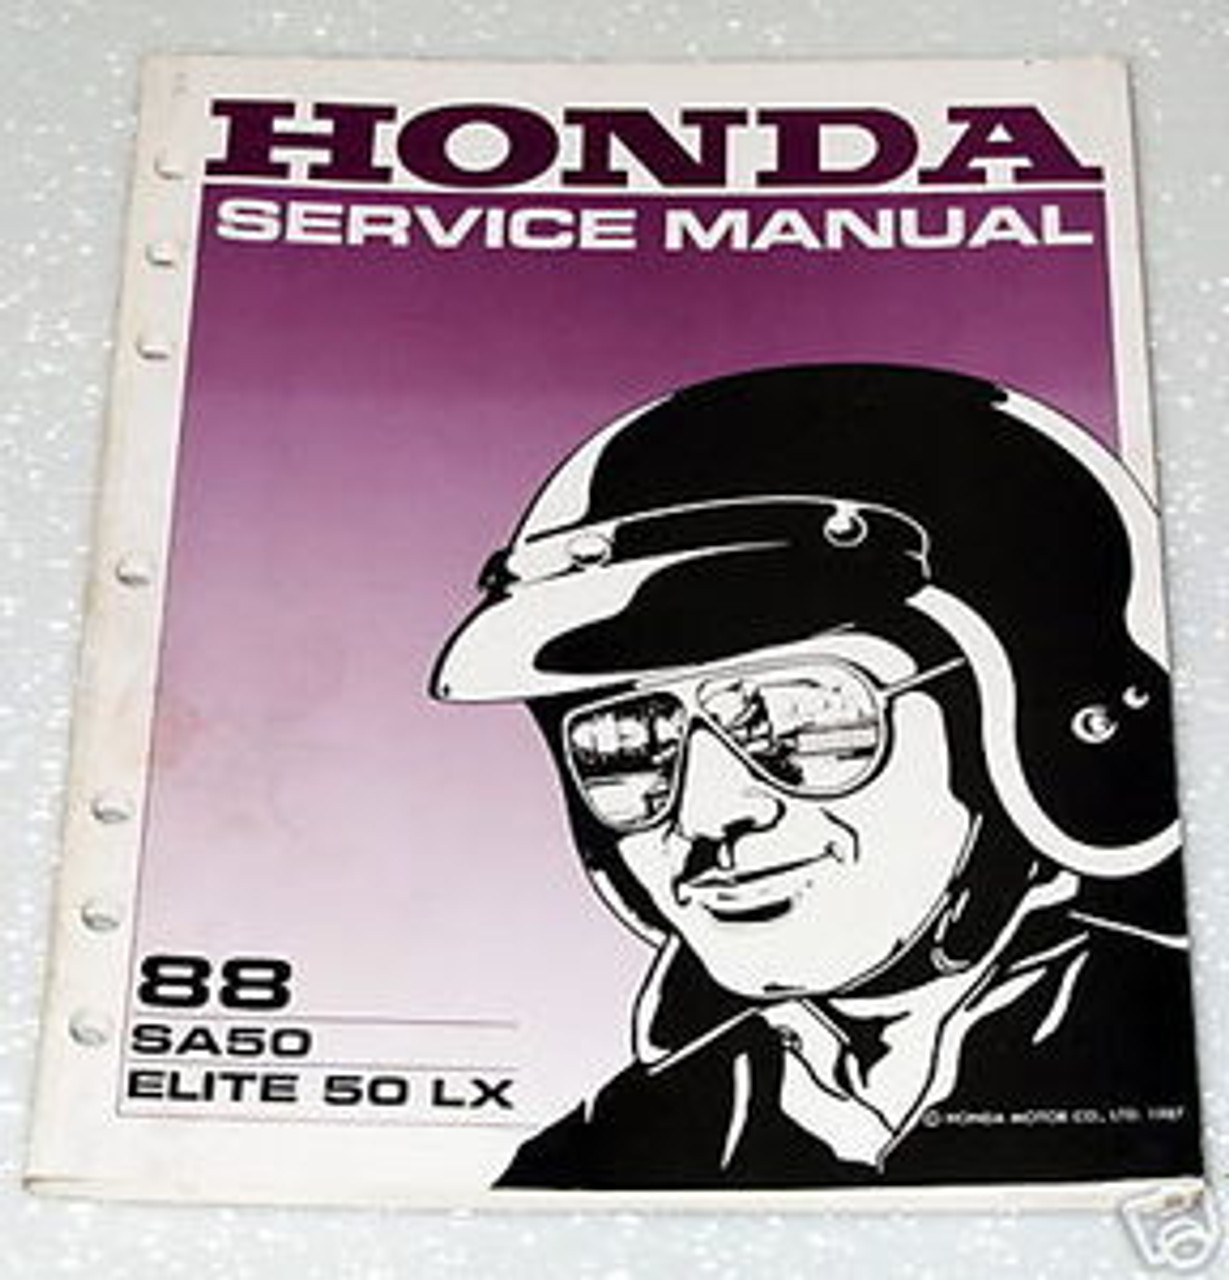 1988 Honda Elite 50 Lx Scooter Sa50 Factory Dealer Shop